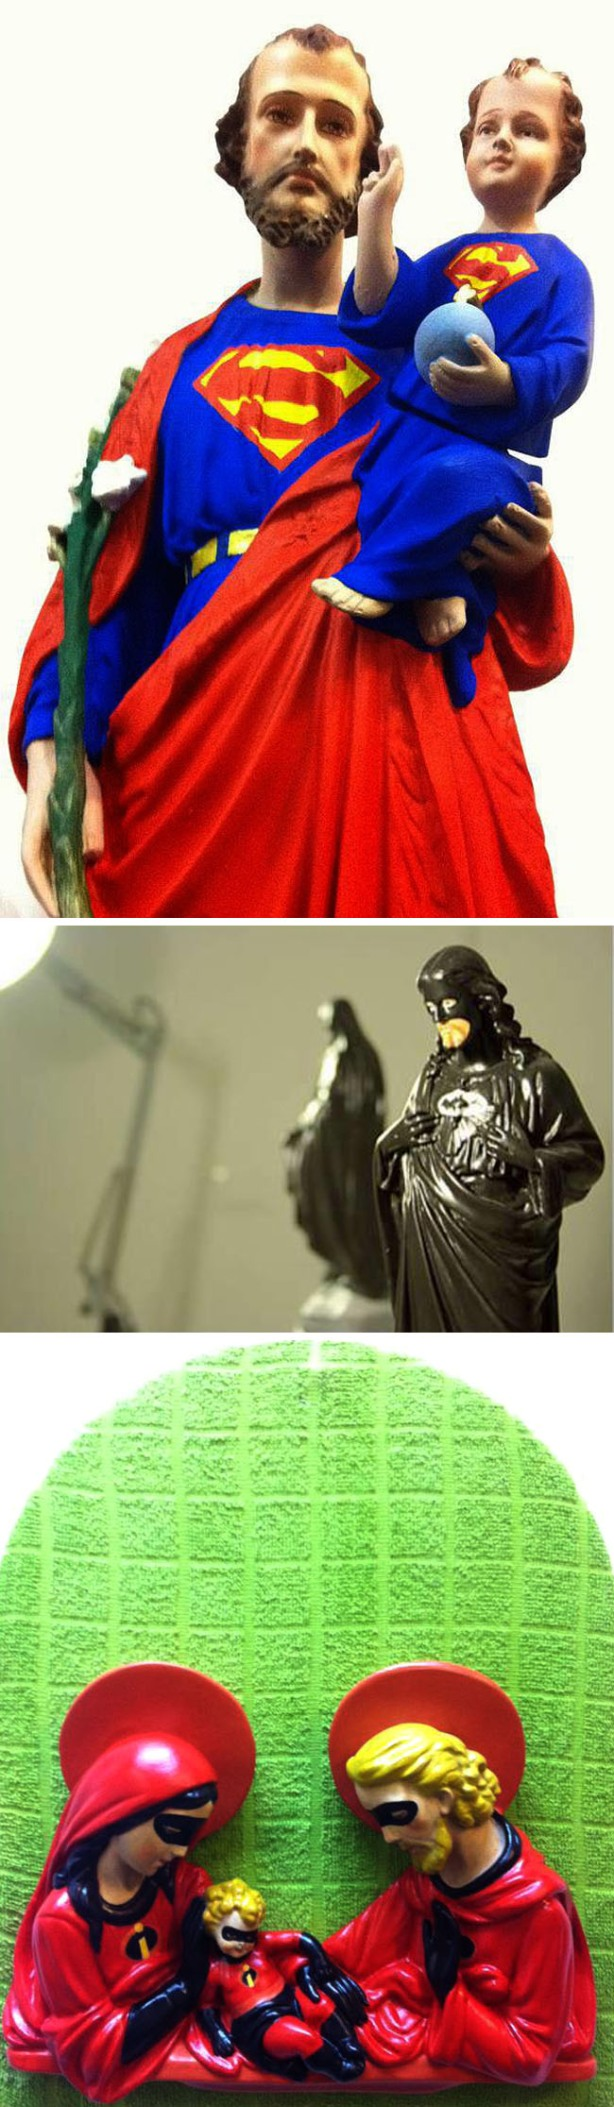 Hagiographies, Batman and Robin, Superman, and the Incredibles as Saints, Igor Scalisi Palminteri, contemporary Italian art, Superhero art